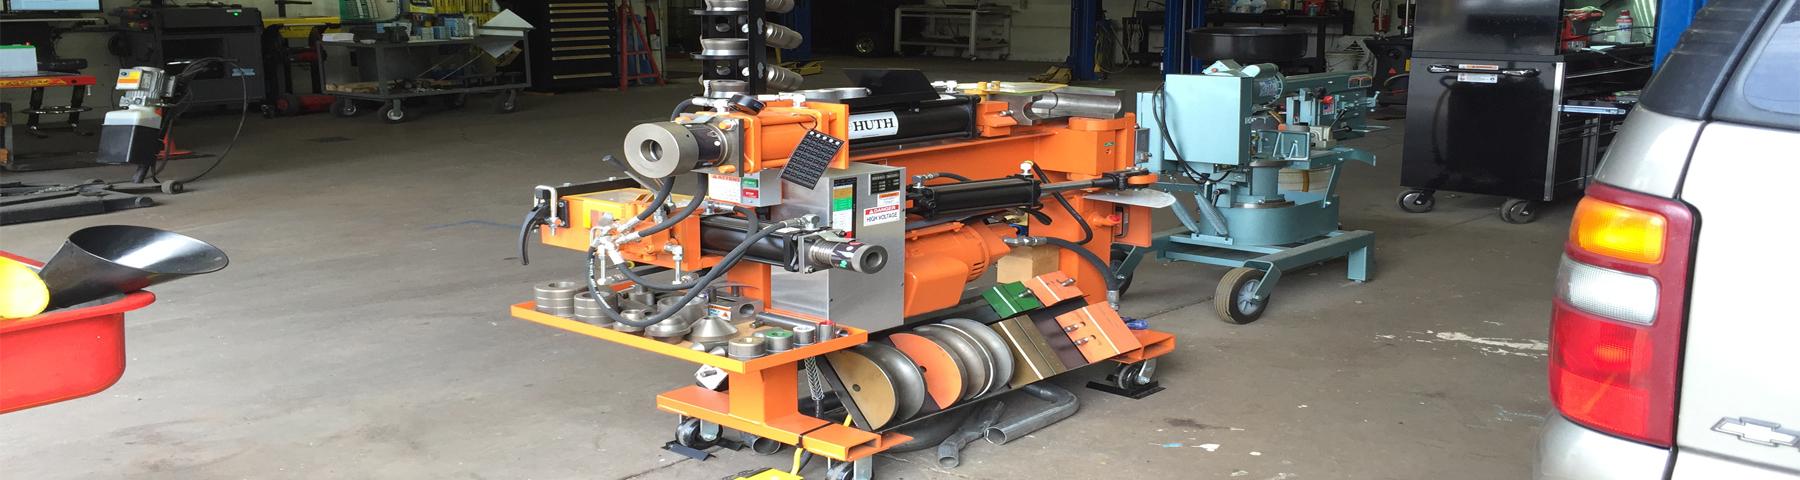 Harkins Service Center Llc Expert Honda And Acura Auto Repair Engine Coolant Change Previous